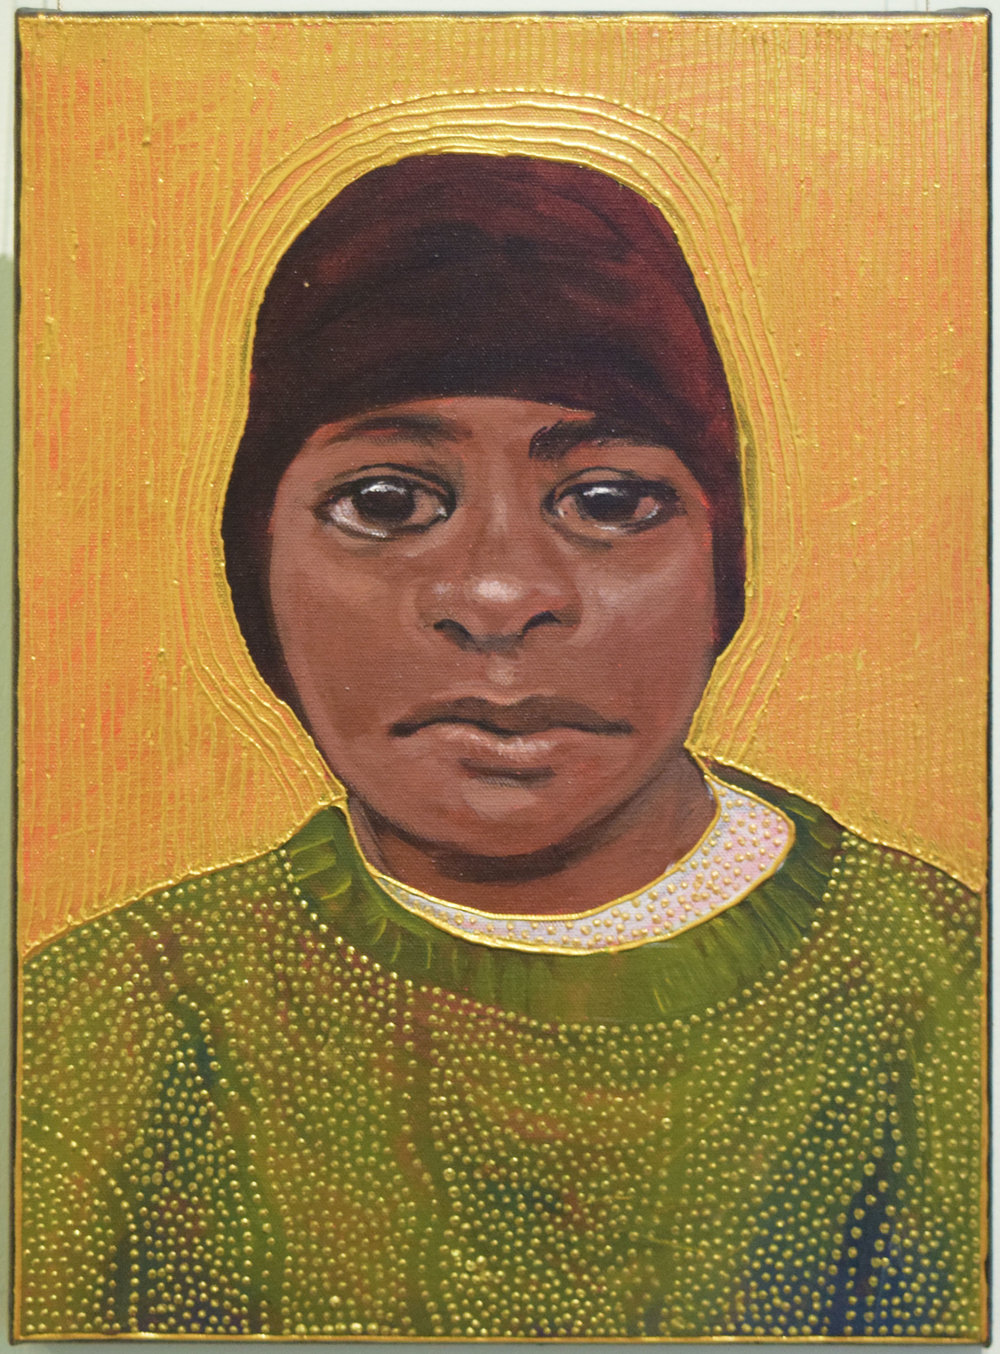 37. Julie Dowling, 'Wandangga' (Winter), 2018, acrylic, mica gold on canvas, 30 x 40 cm, $2,000